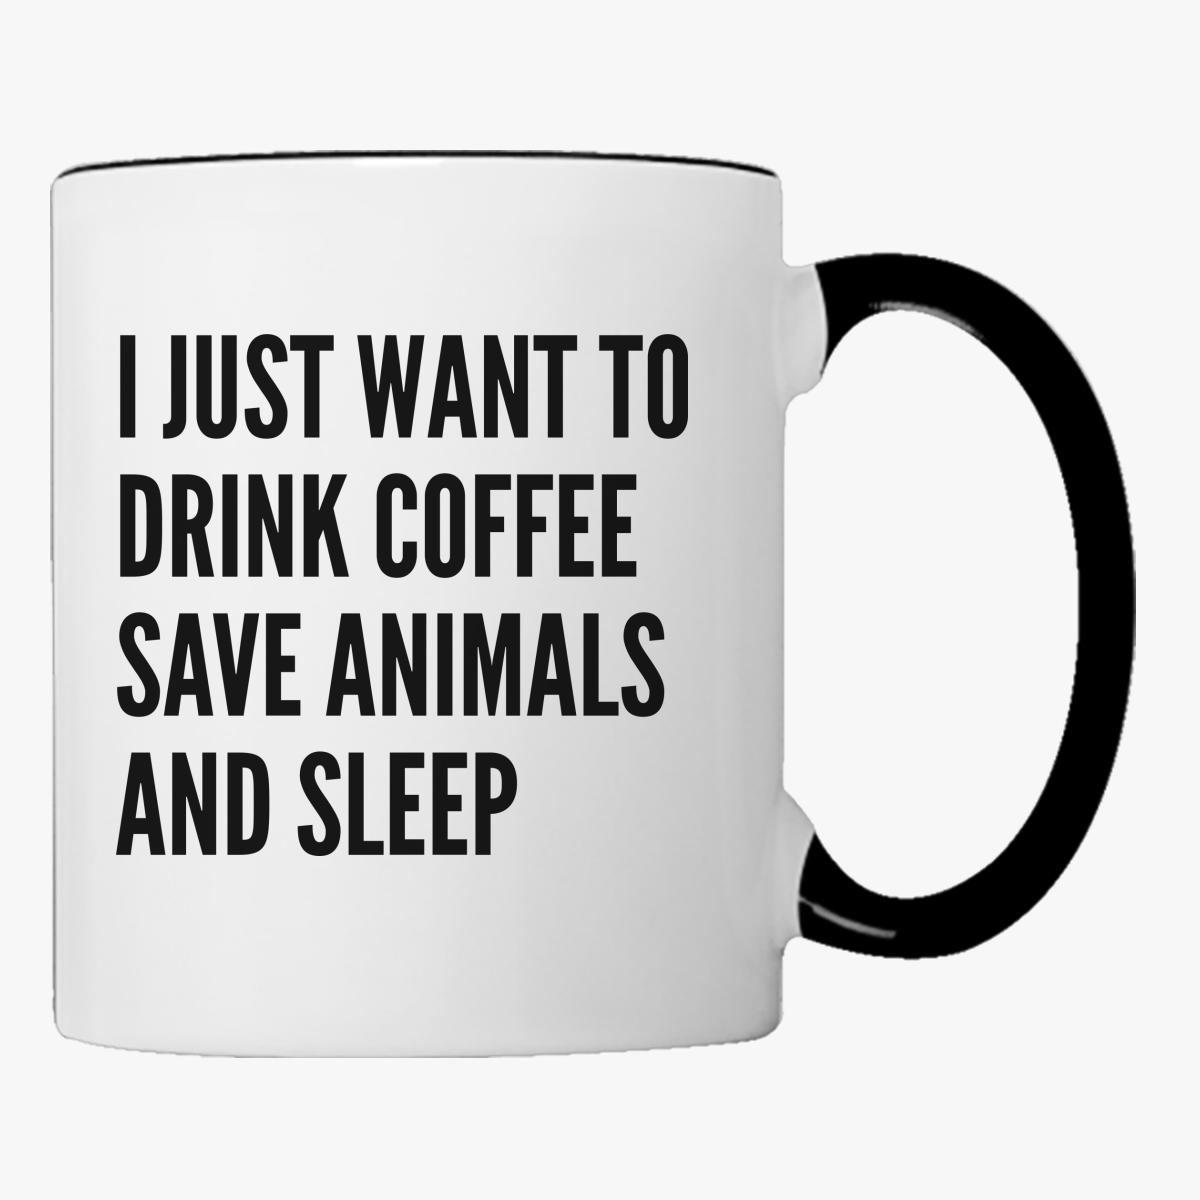 Buy just want drink coffee save animals sleep Coffee Mug, 480520